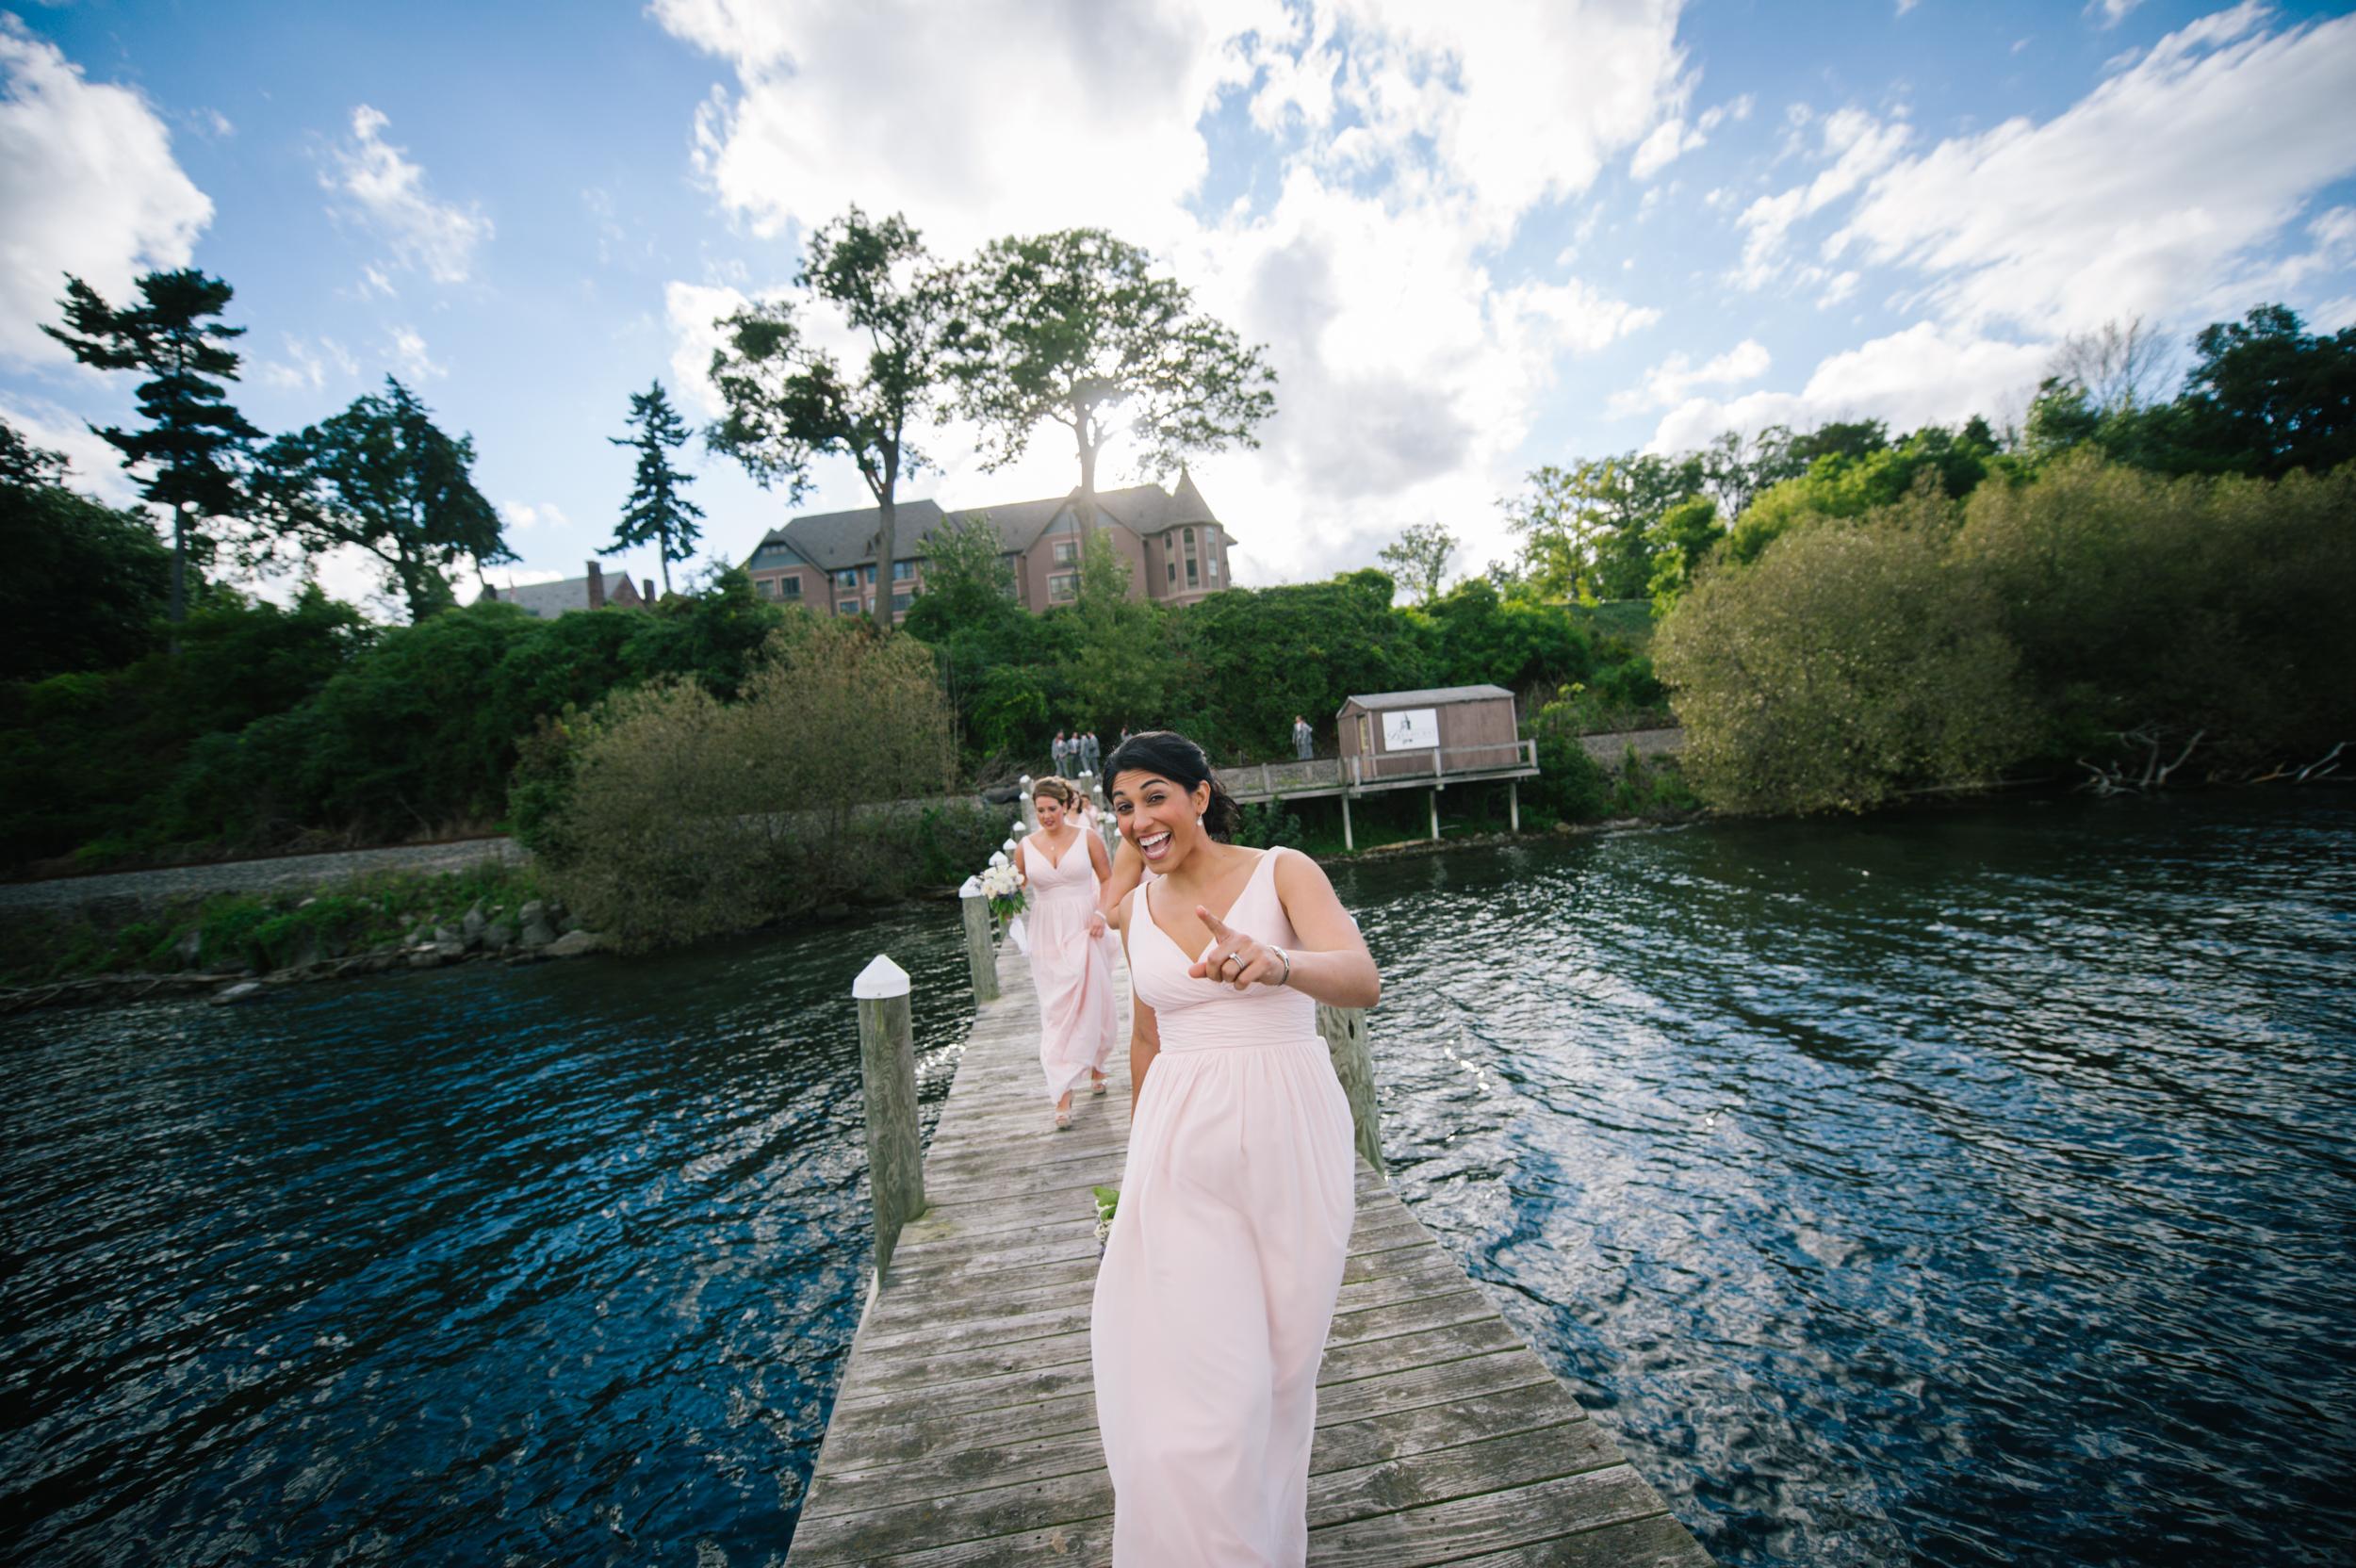 JKP-Destination-Weddings-0097.JPG